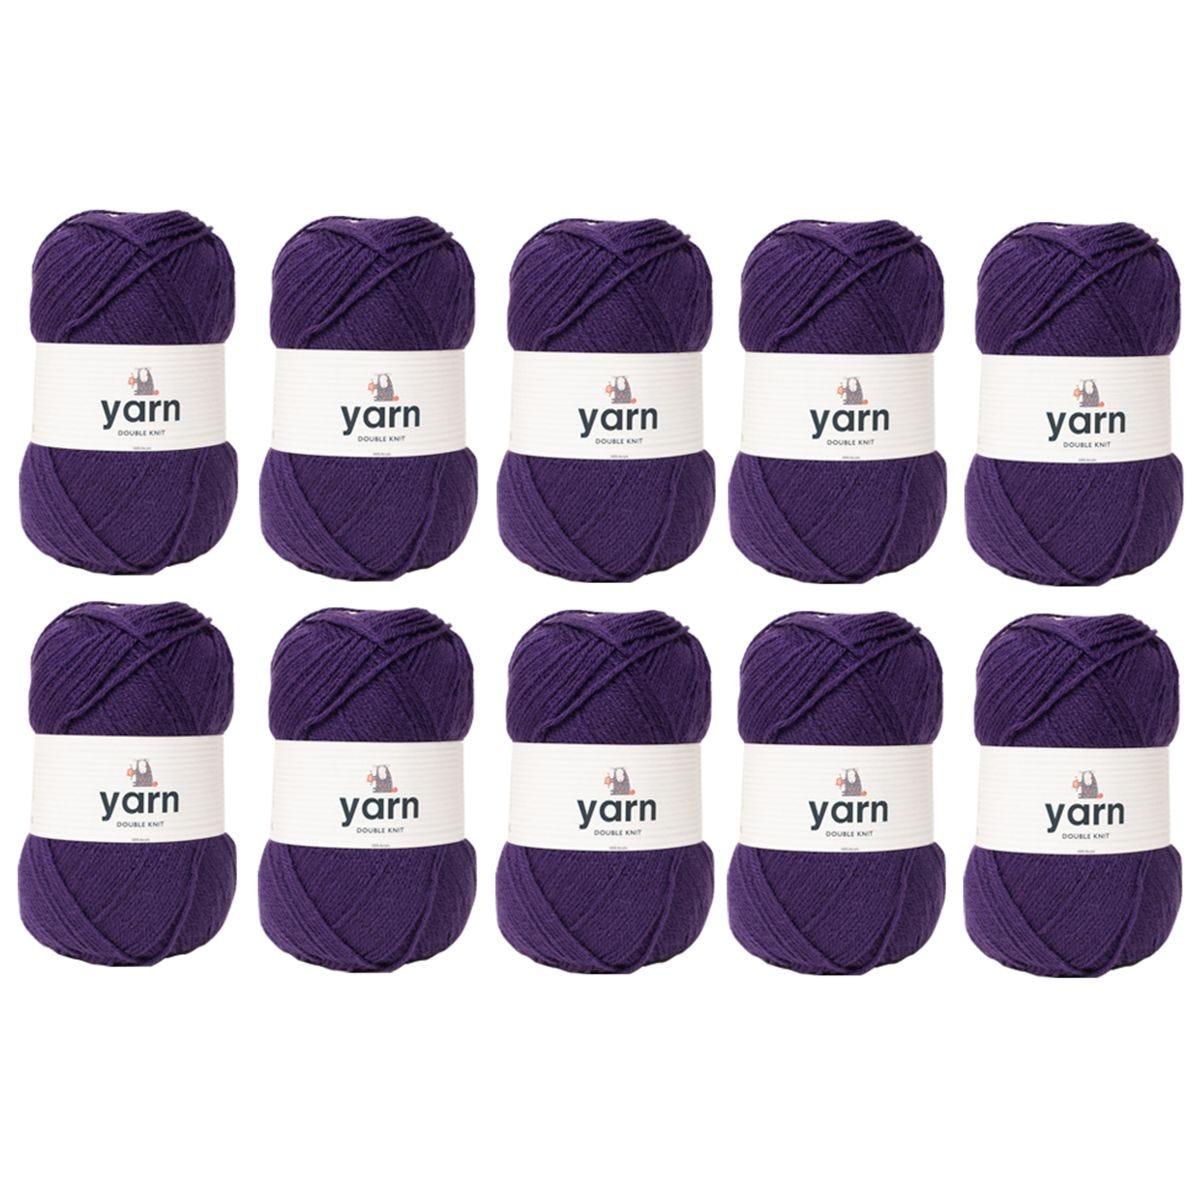 Korbond Purple Double Knit Yarn Bulk Pack Bundle - 10 x 100g